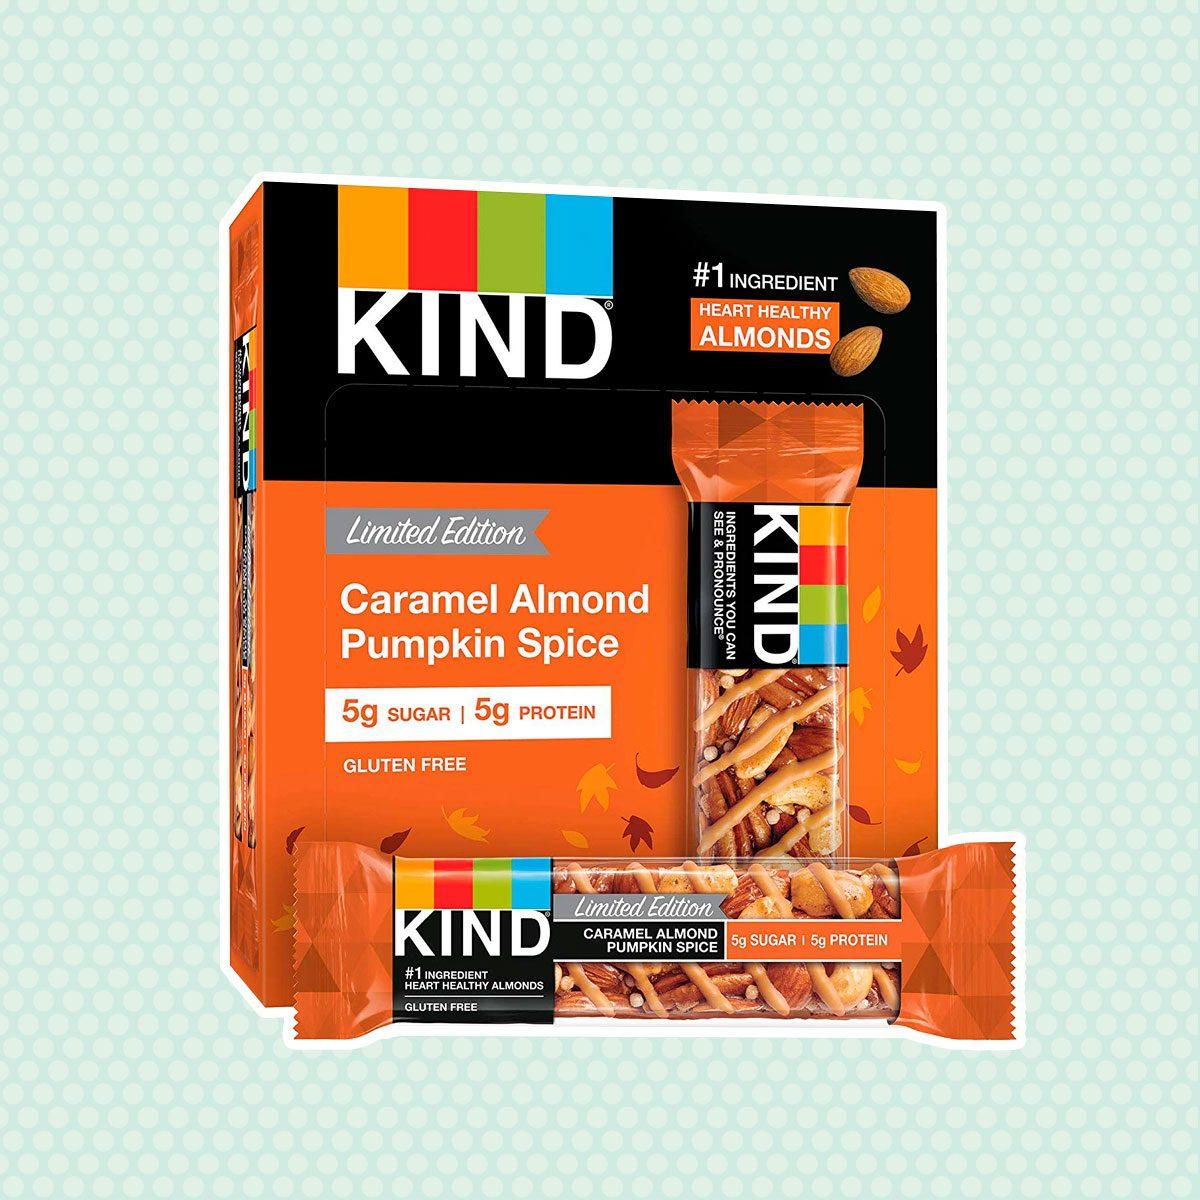 KIND Caramel Almond Pumpkin Spice Bars